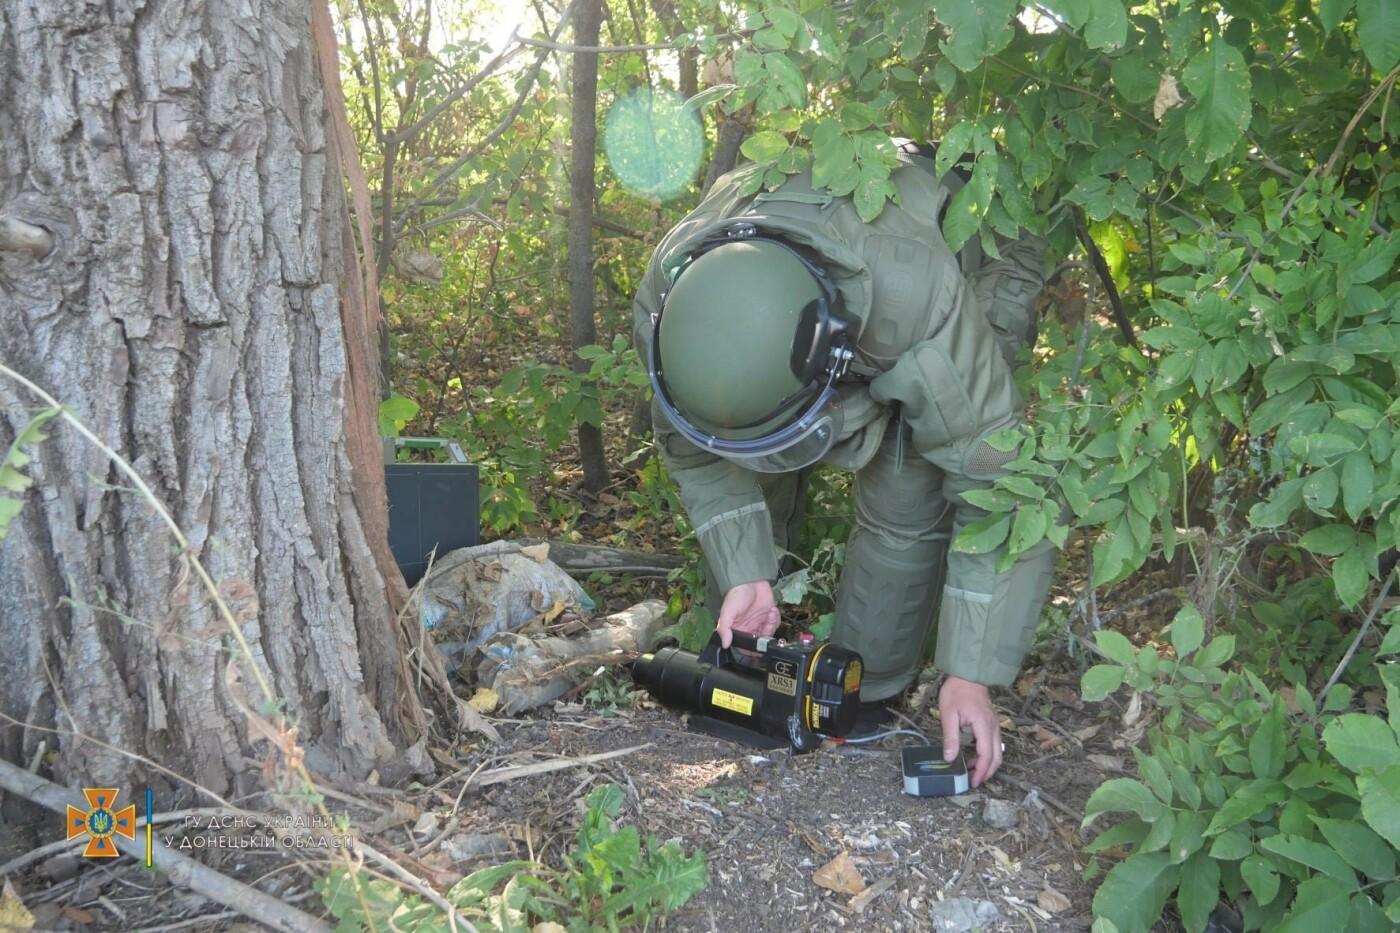 Саперы обезвредили боеприпас на трассе под Волновахой, - ФОТО, фото-8